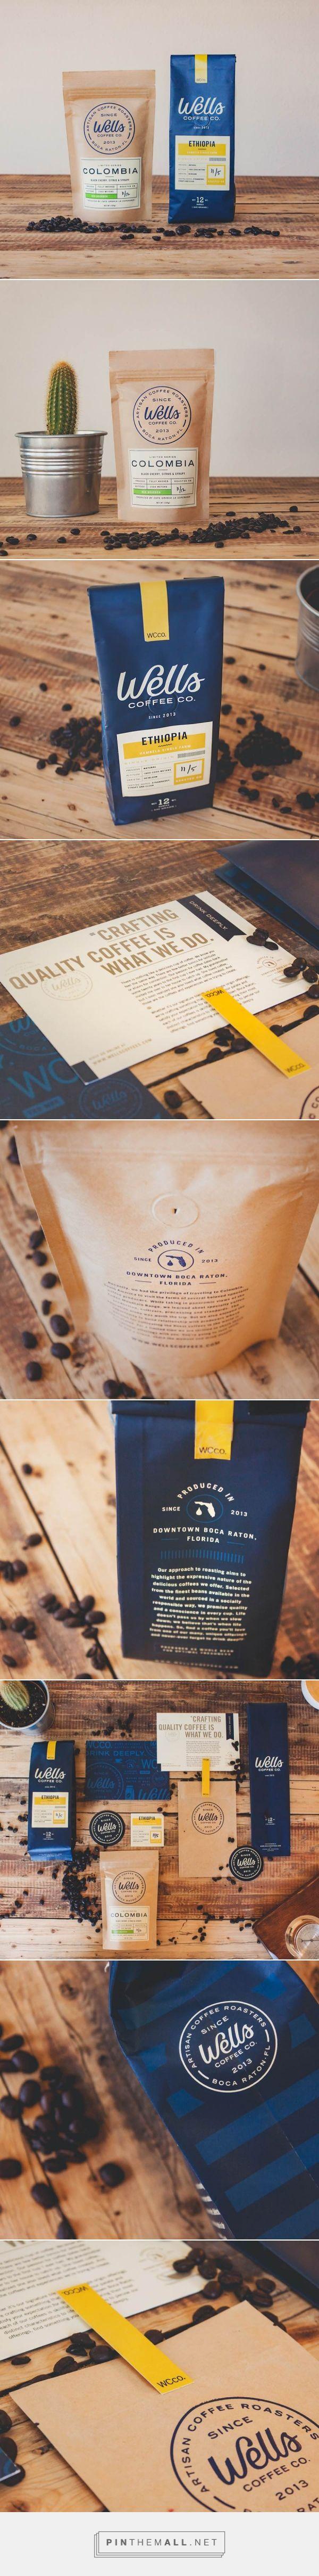 Wells Coffee Packaging Design                                                                                                                                                     More